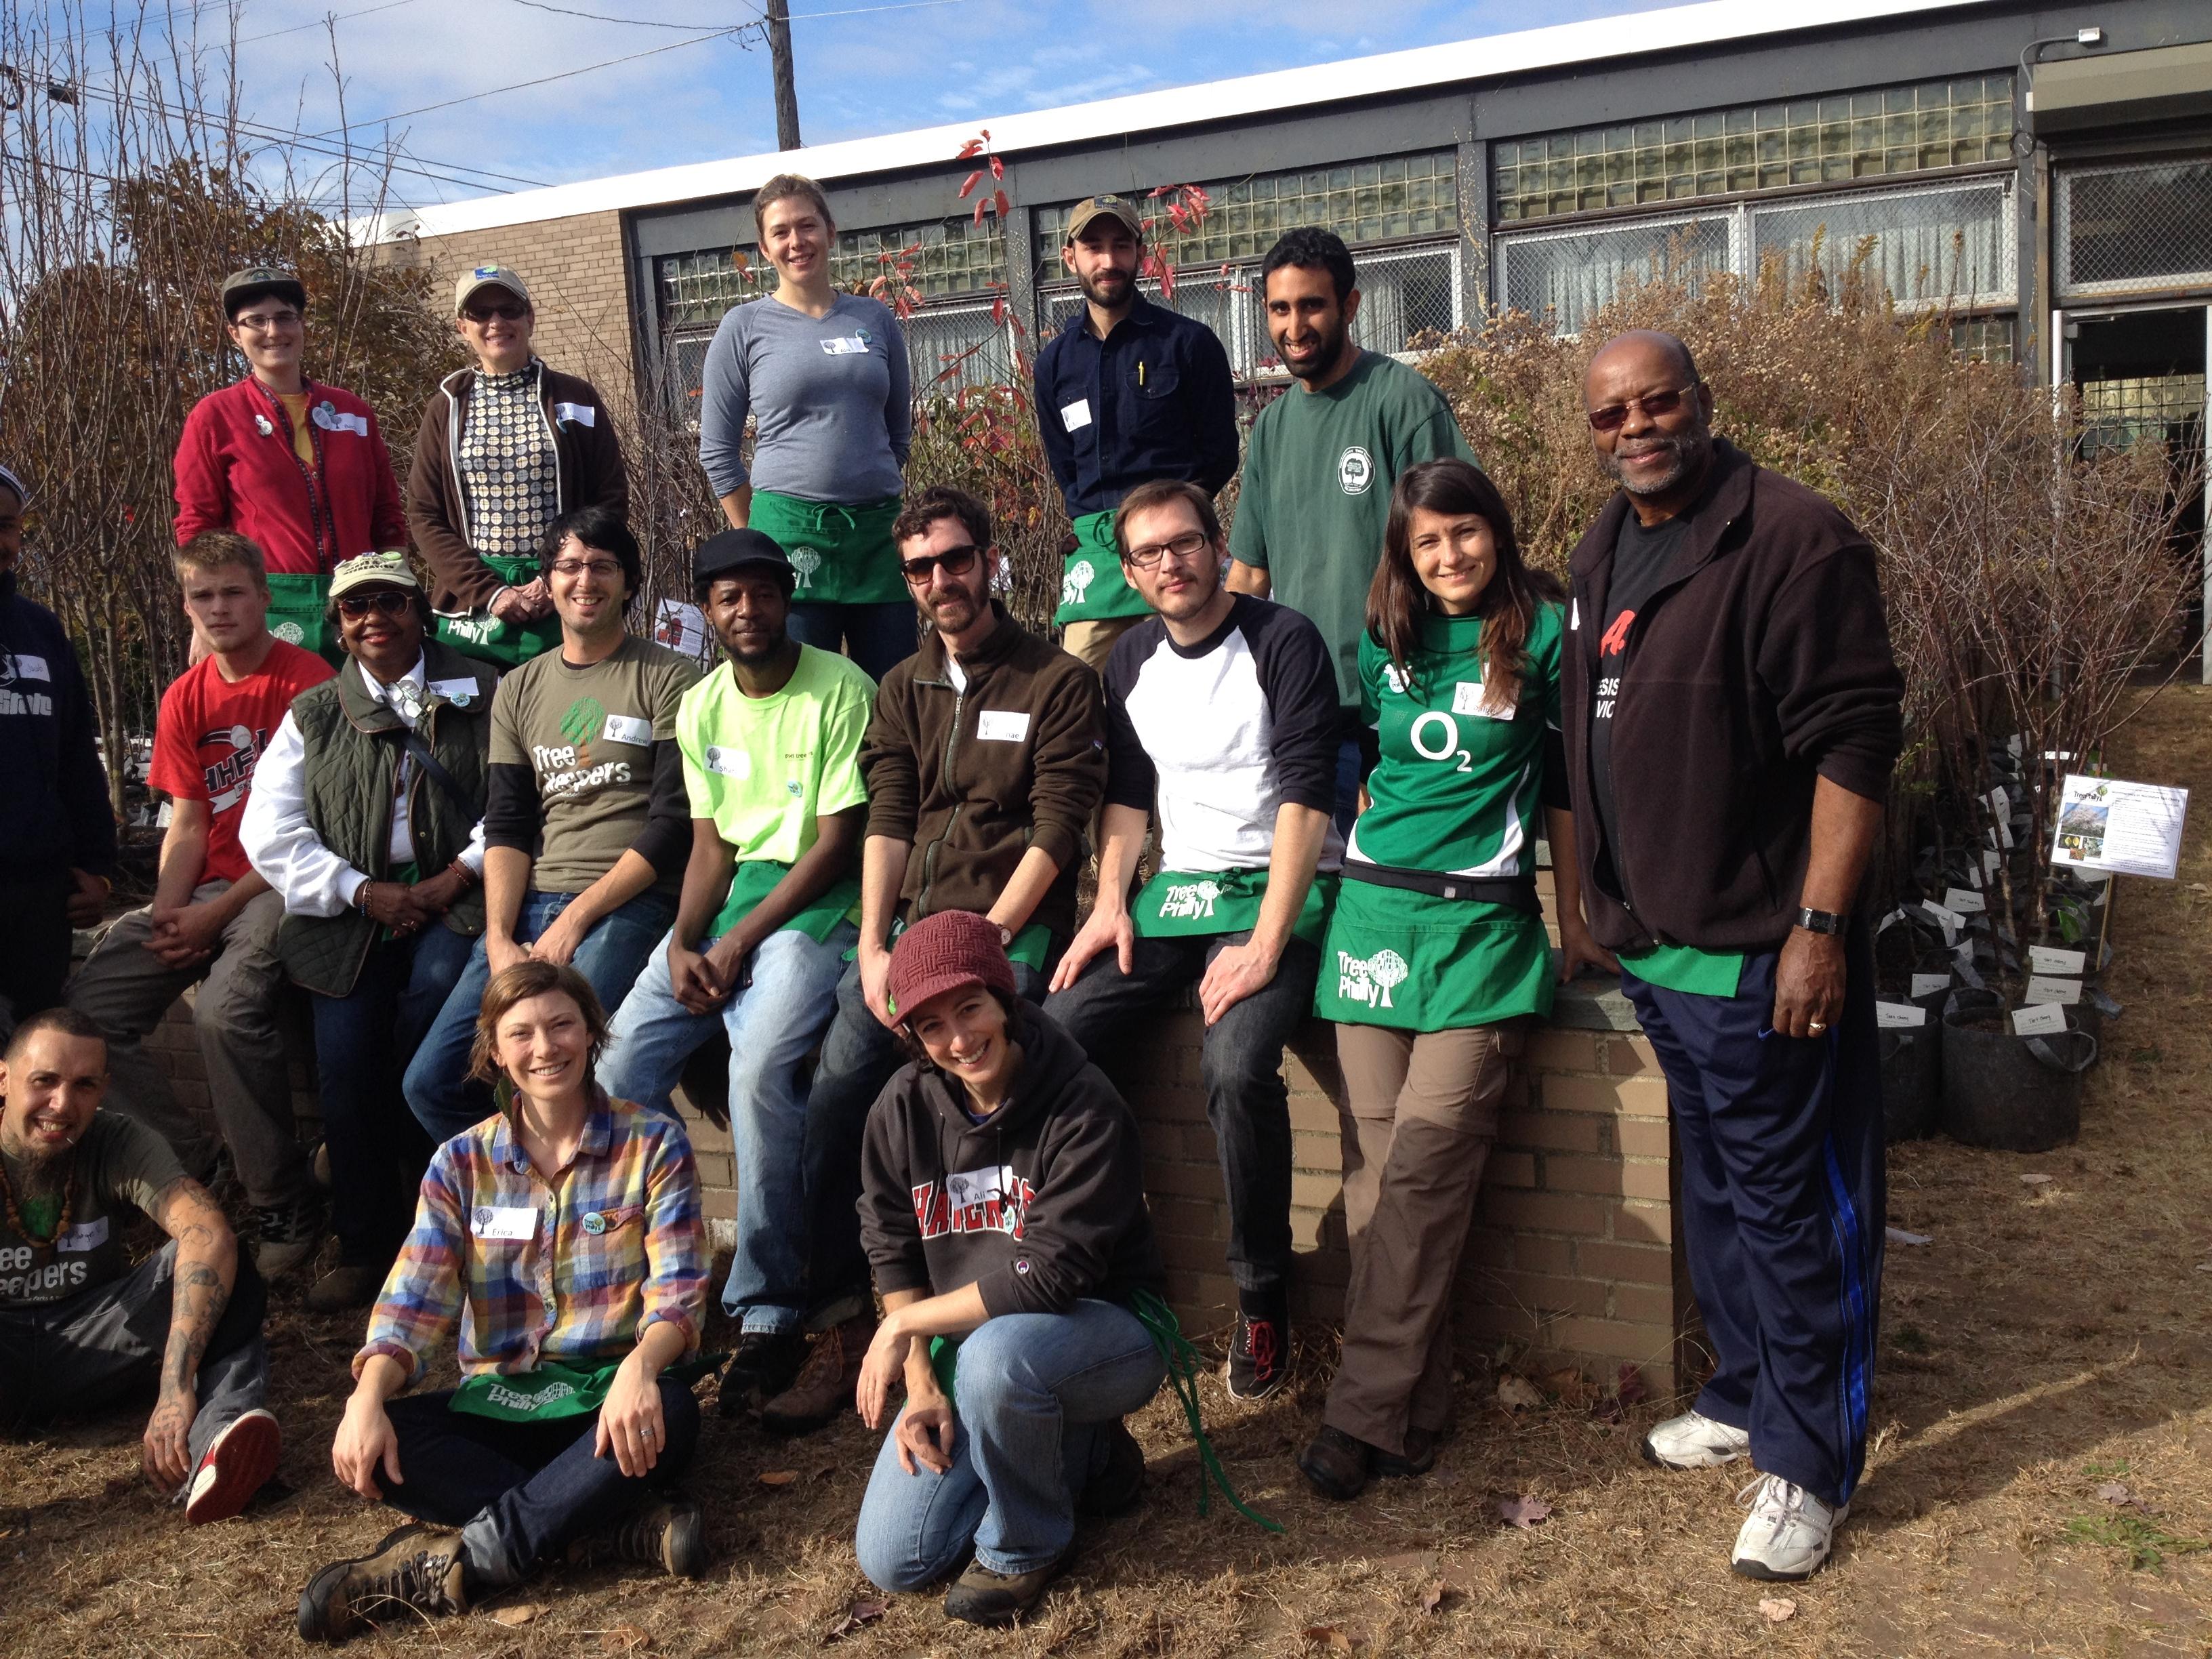 F13 West Oak Lane 11.17 - the volunteers